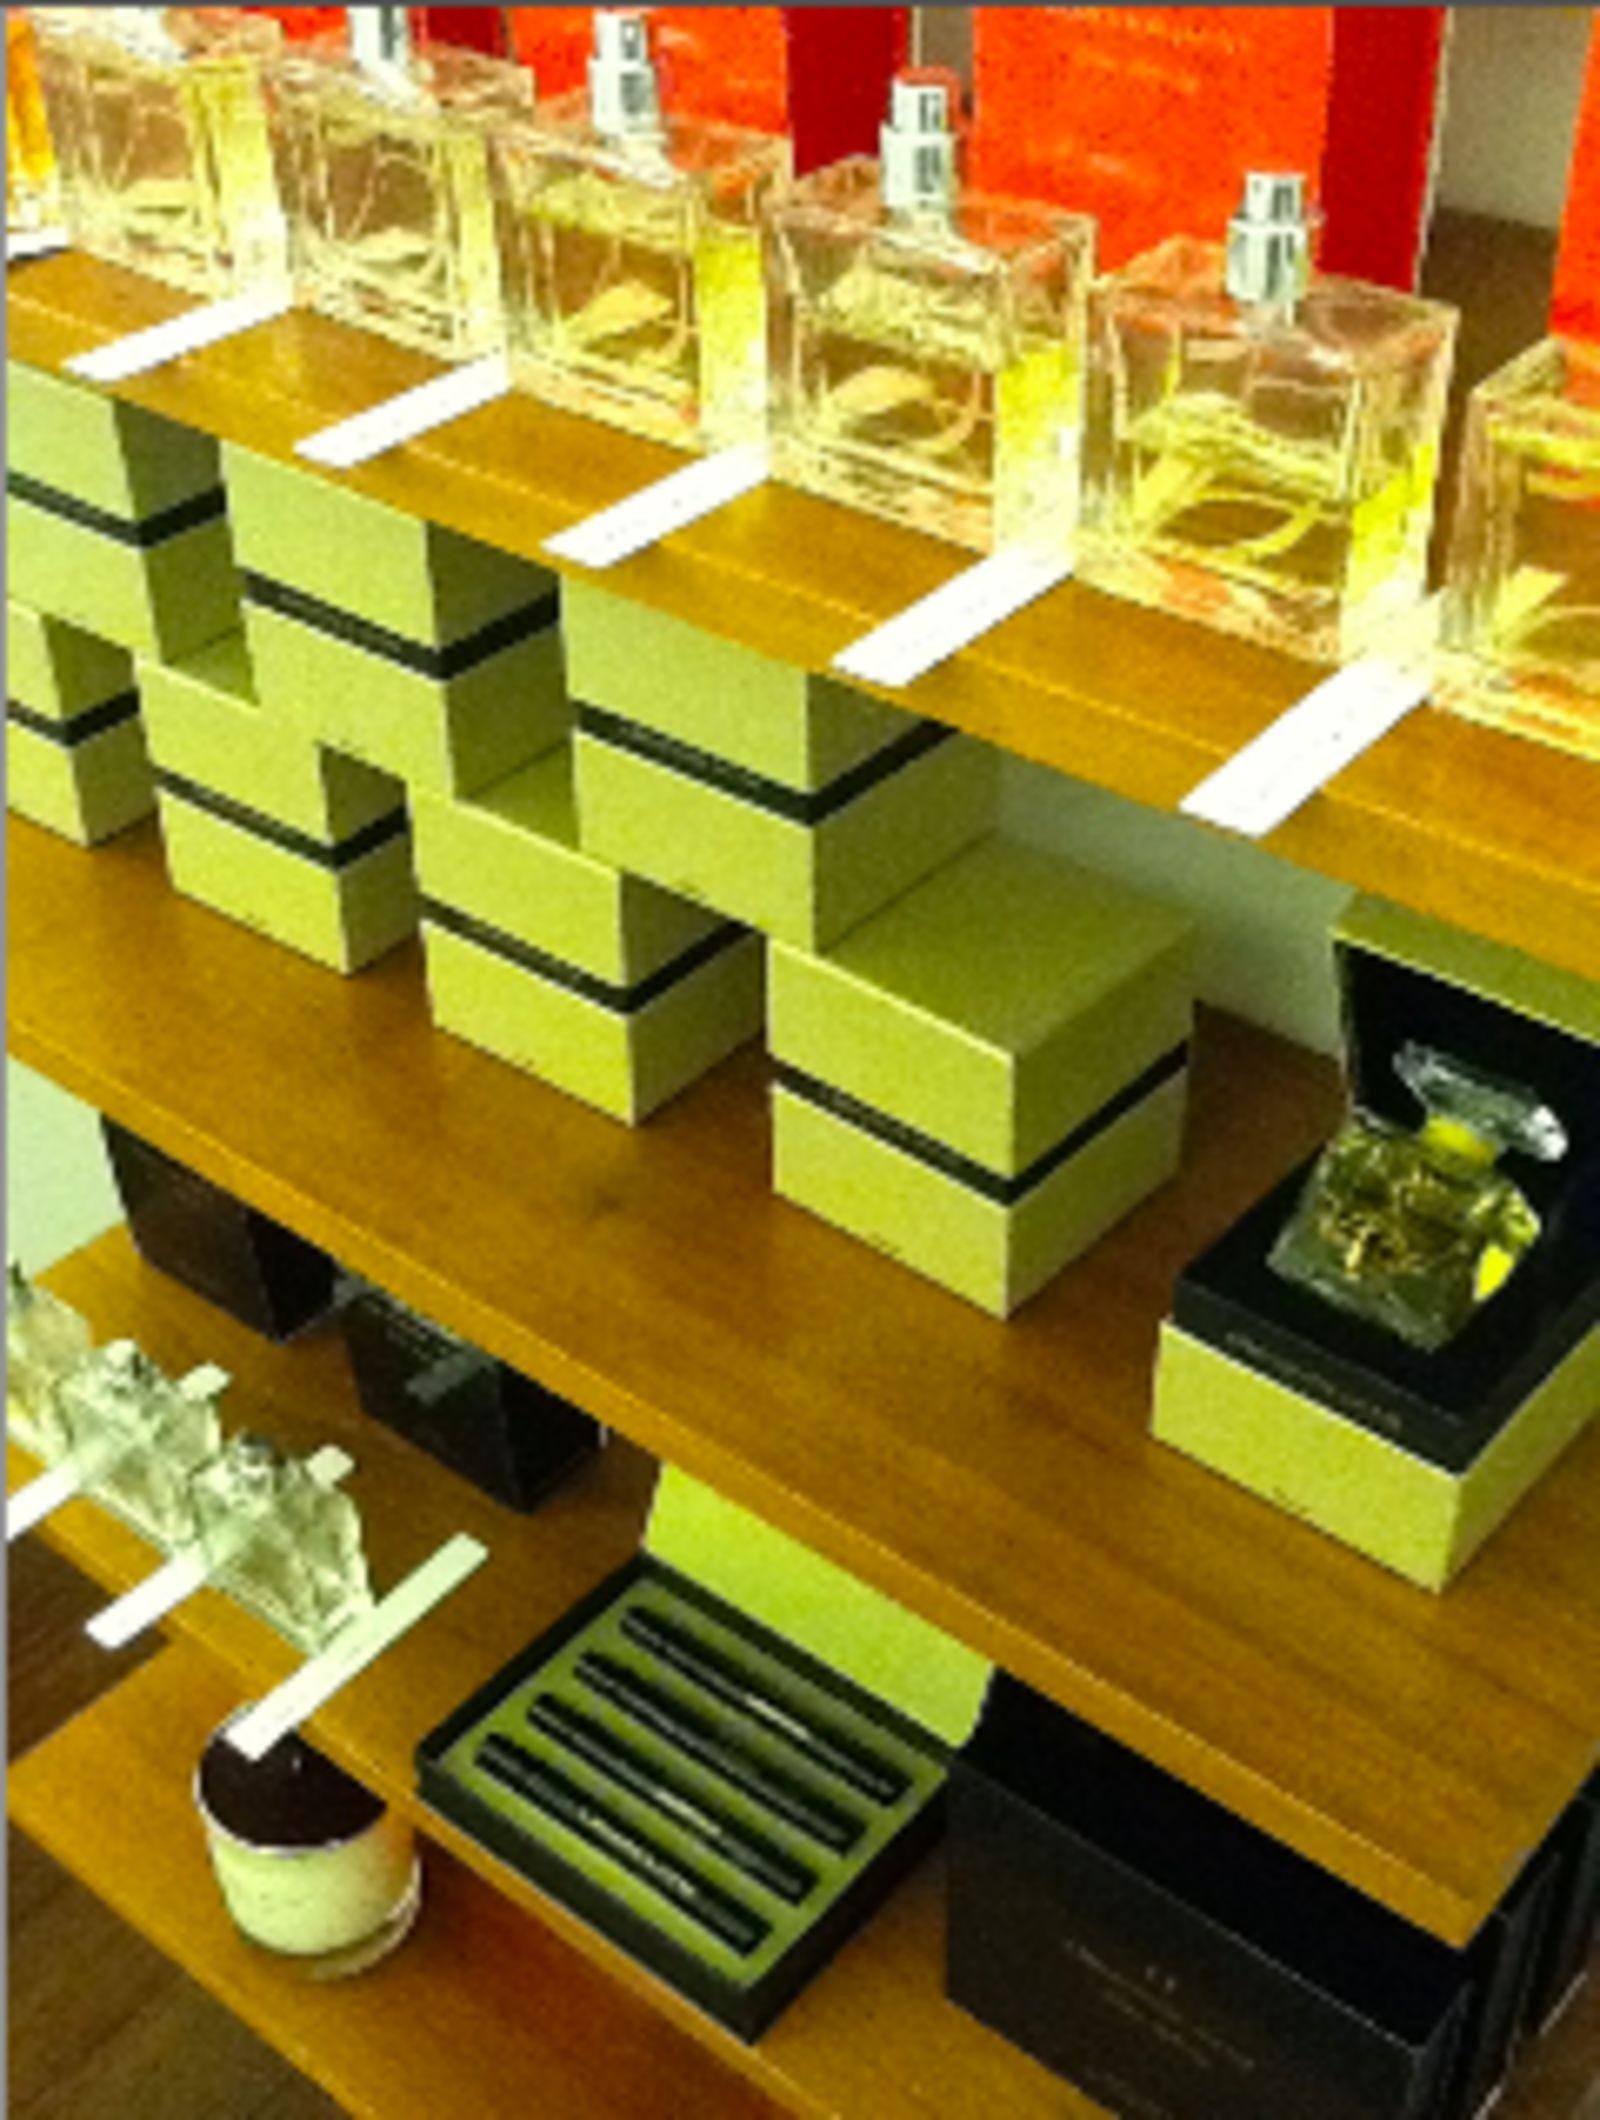 BREATHE fresh cosmetics in Berlin (Bild 15)